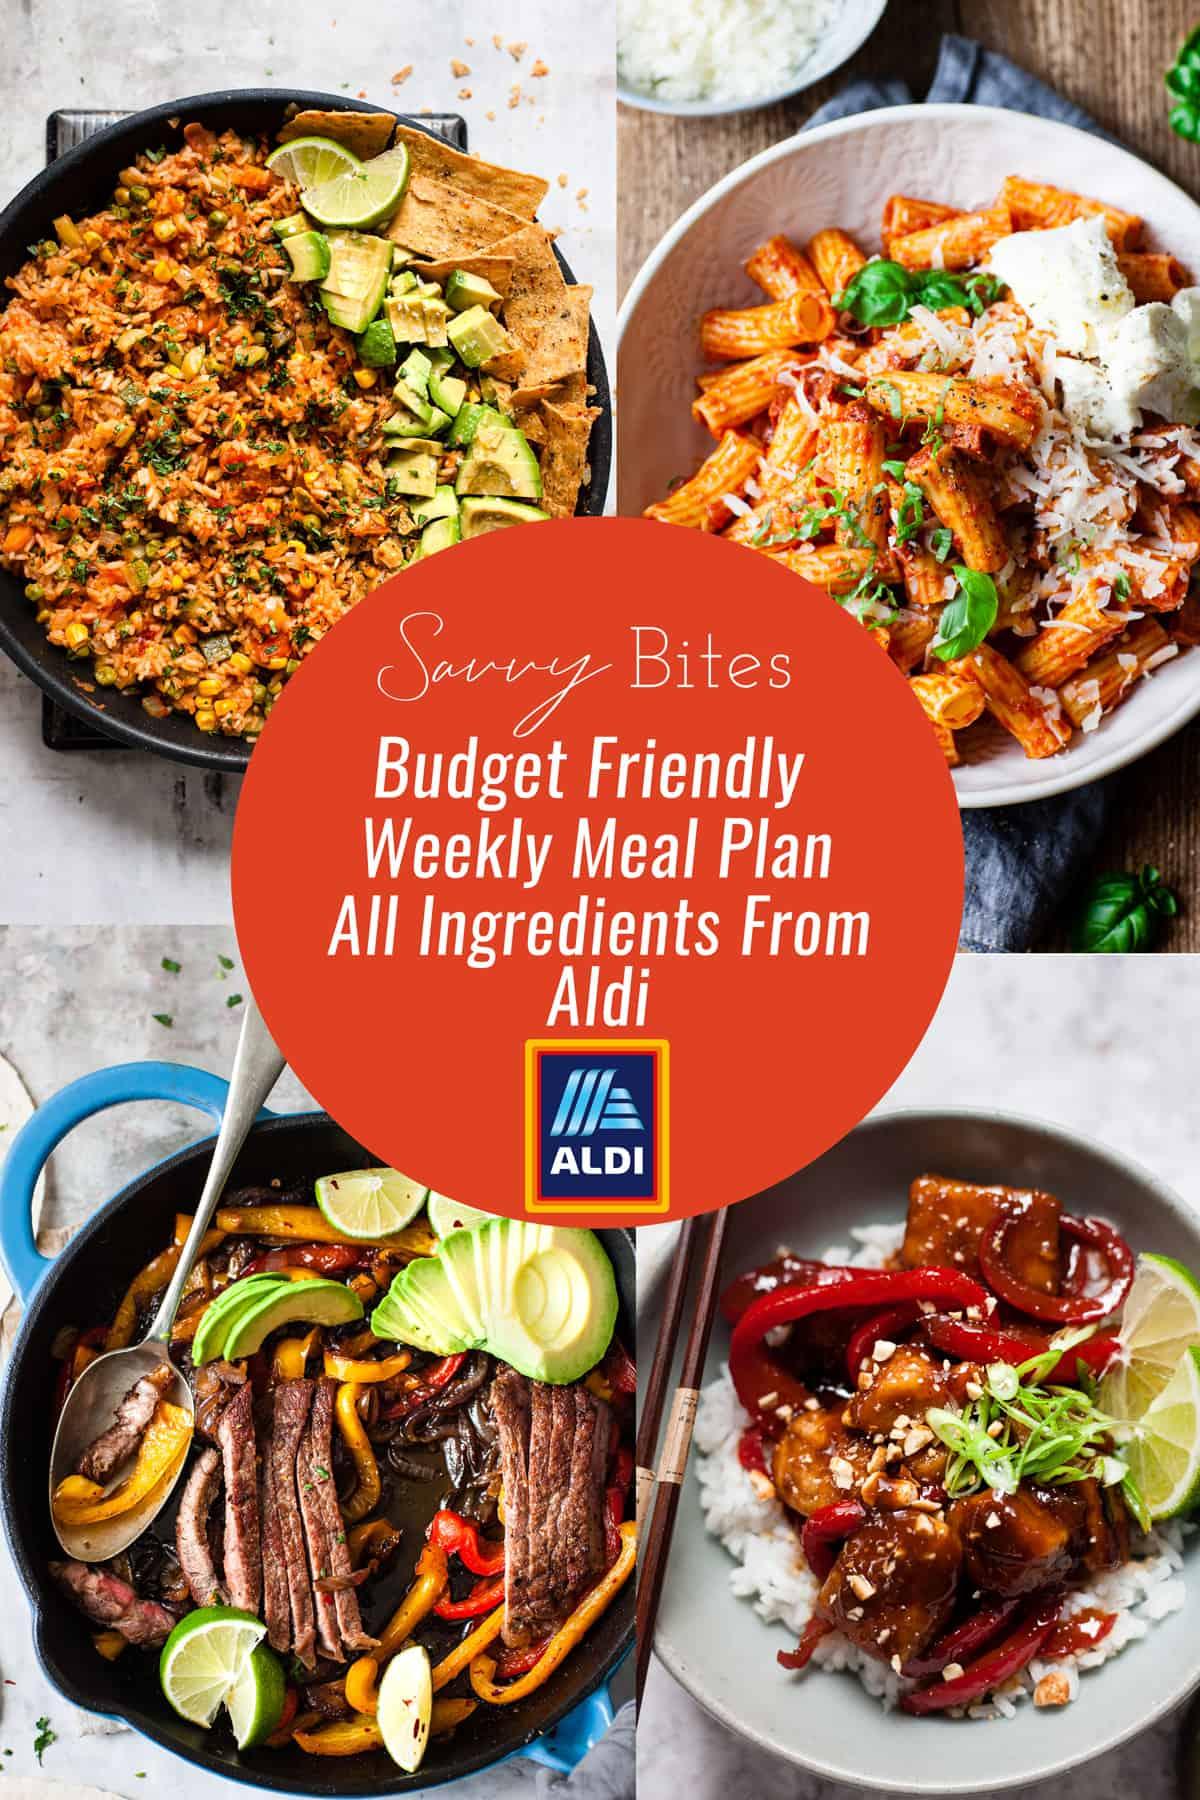 Aldi meal plan weekly budget meal plan